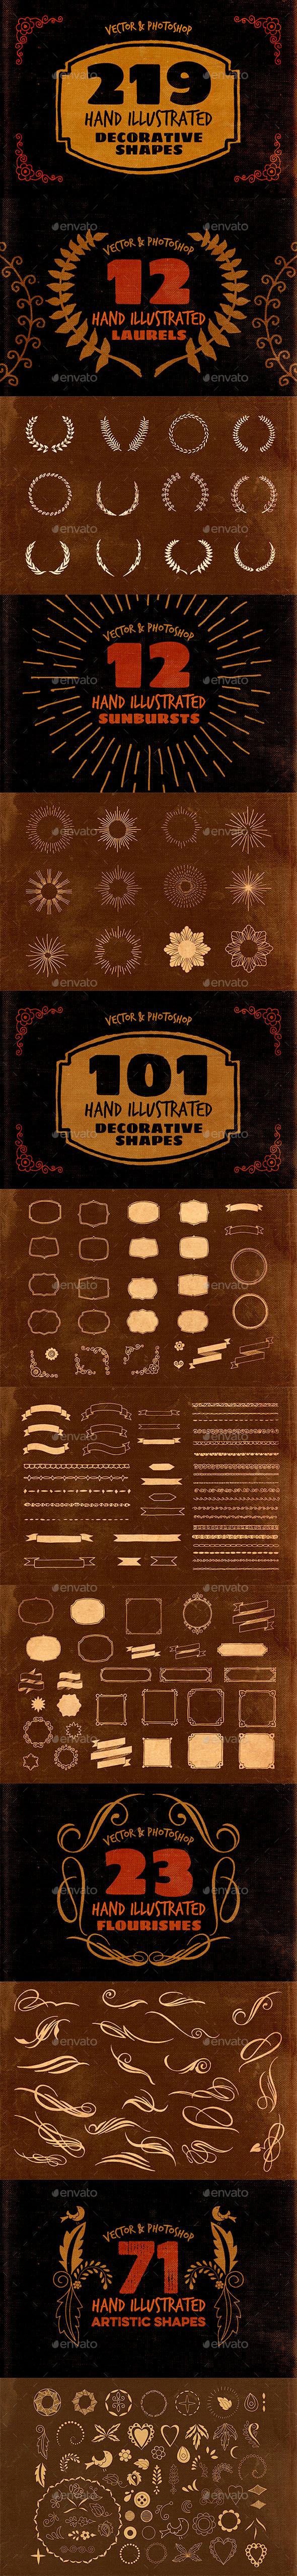 219 Hand Drawn Decorative Shapes - Decorative Symbols Decorative